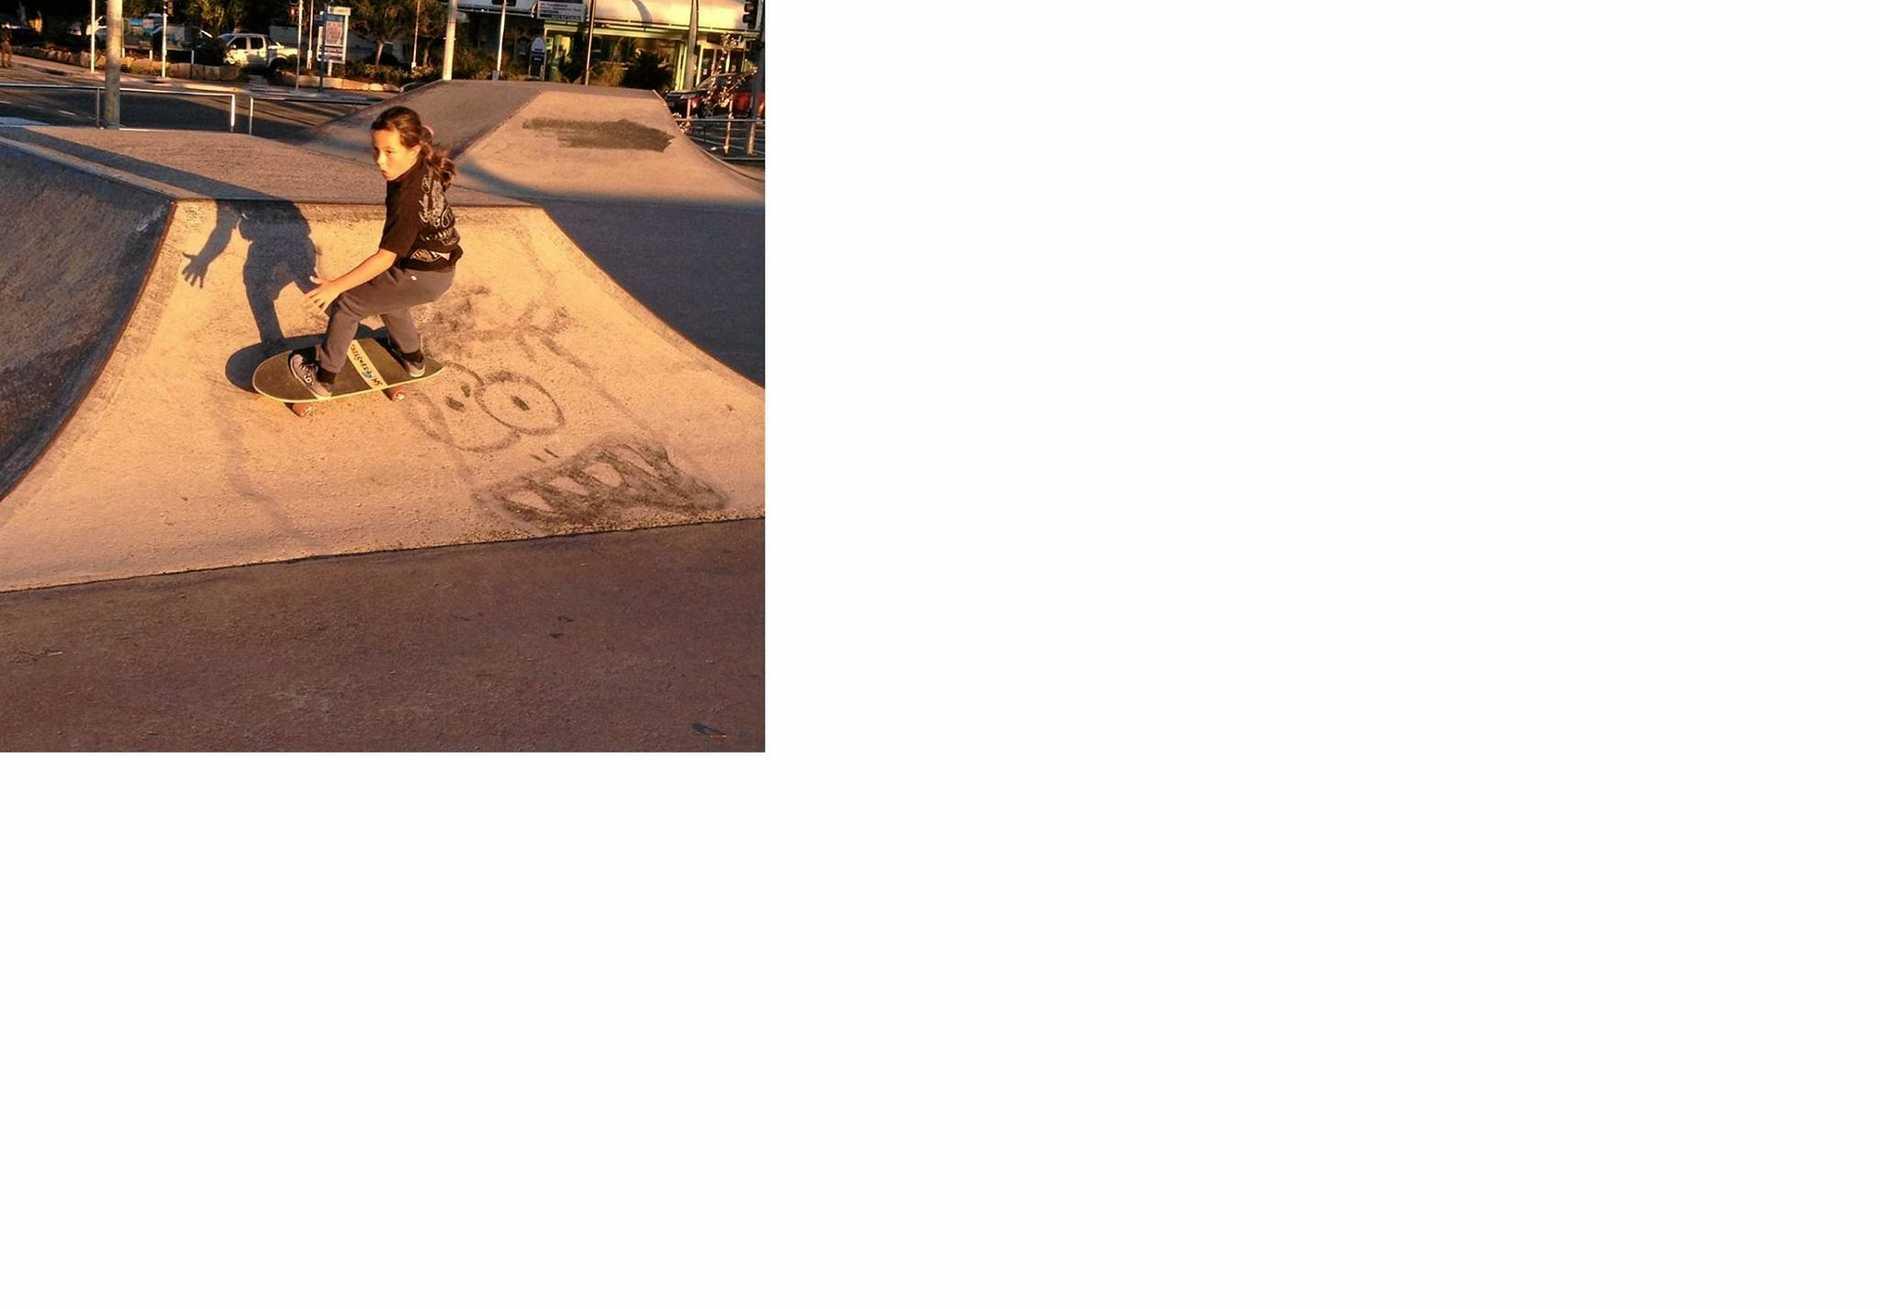 A SmoothStar skateboard.